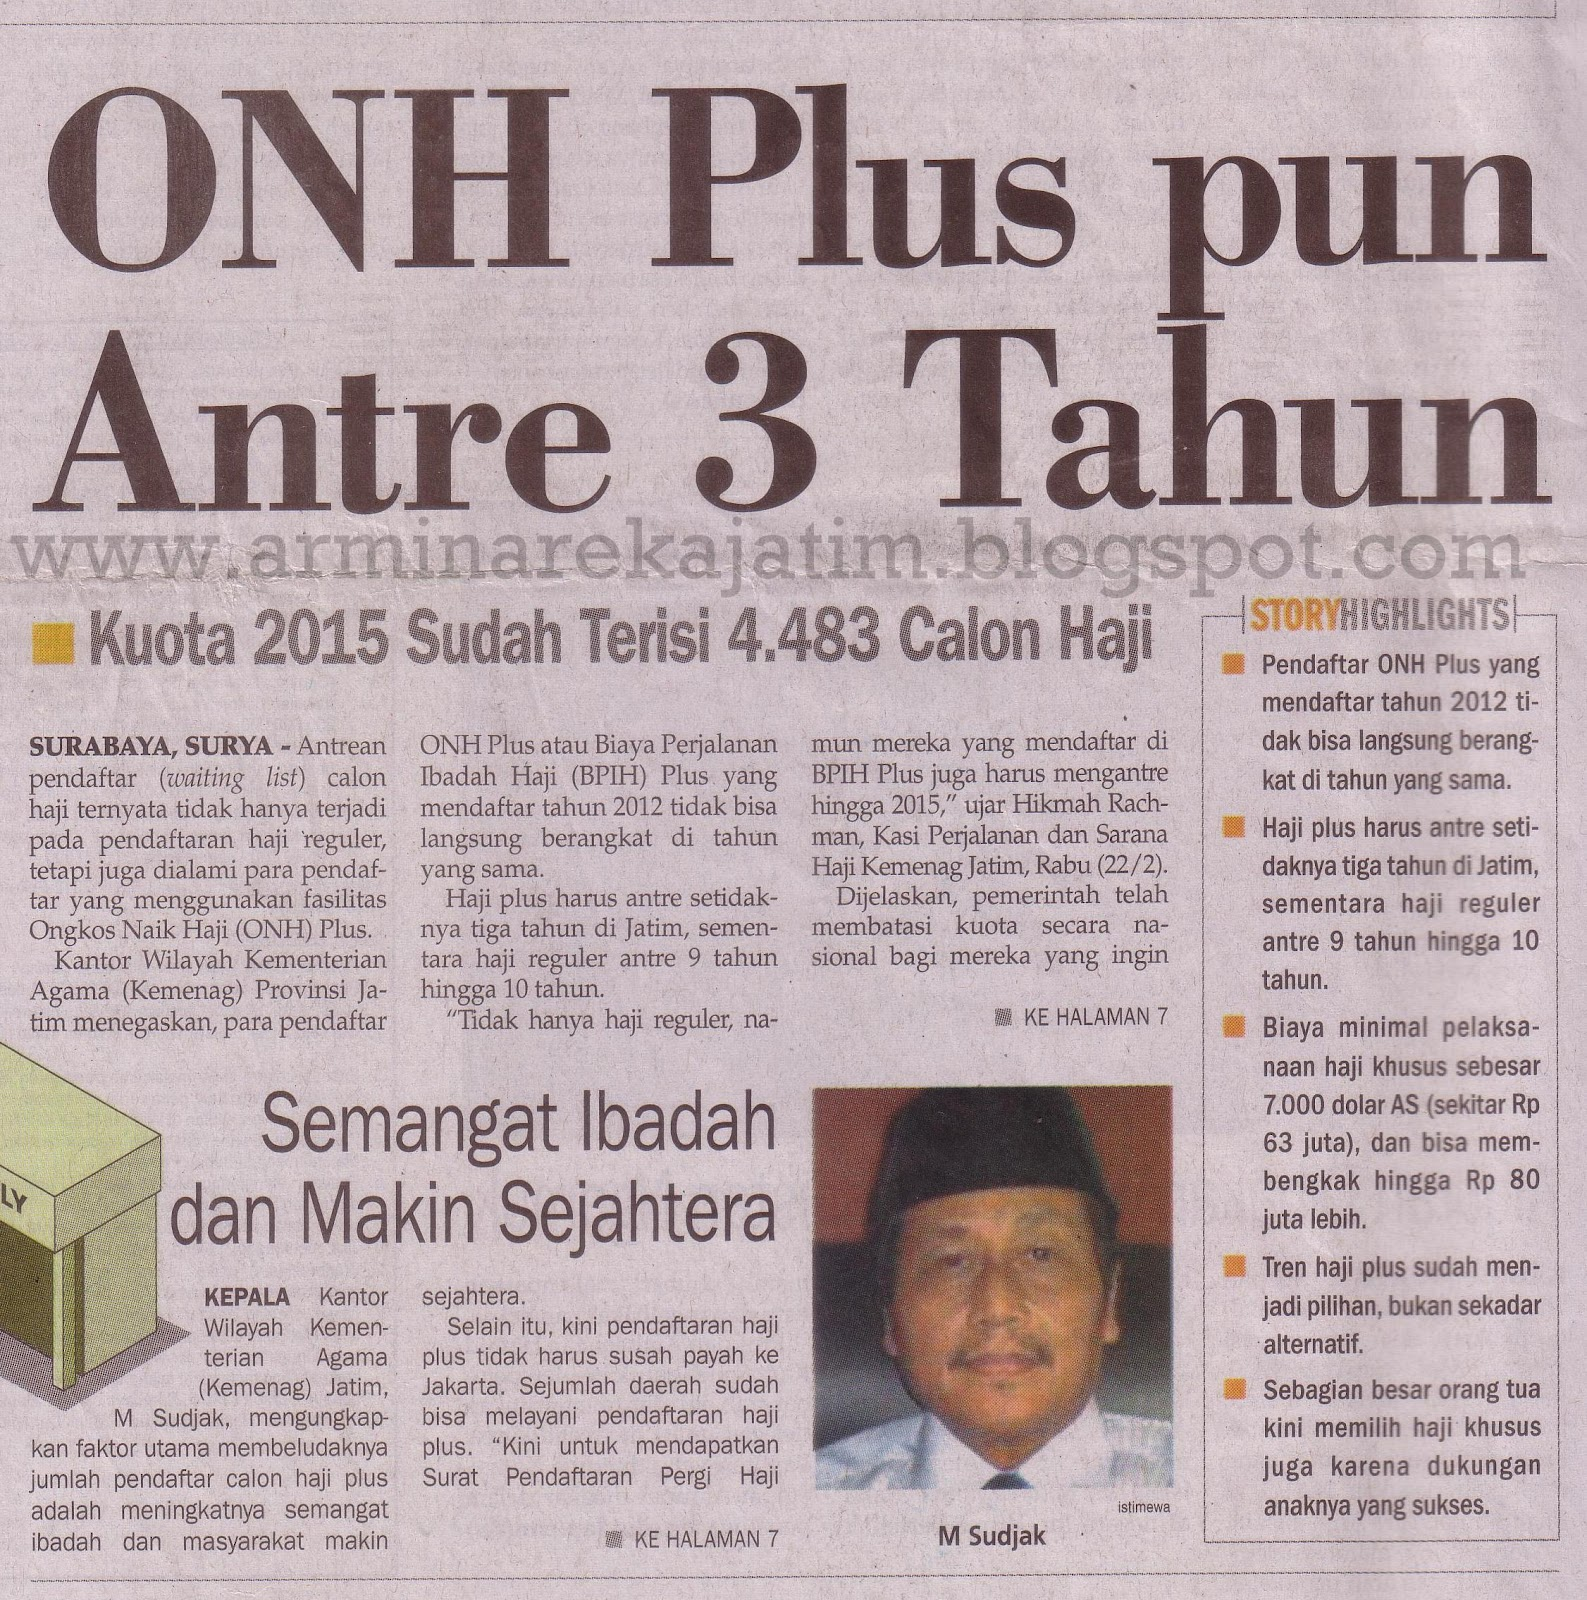 Ongkos Naik Haji Plus Antri 3 Tahun | Arminareka Perdana ...